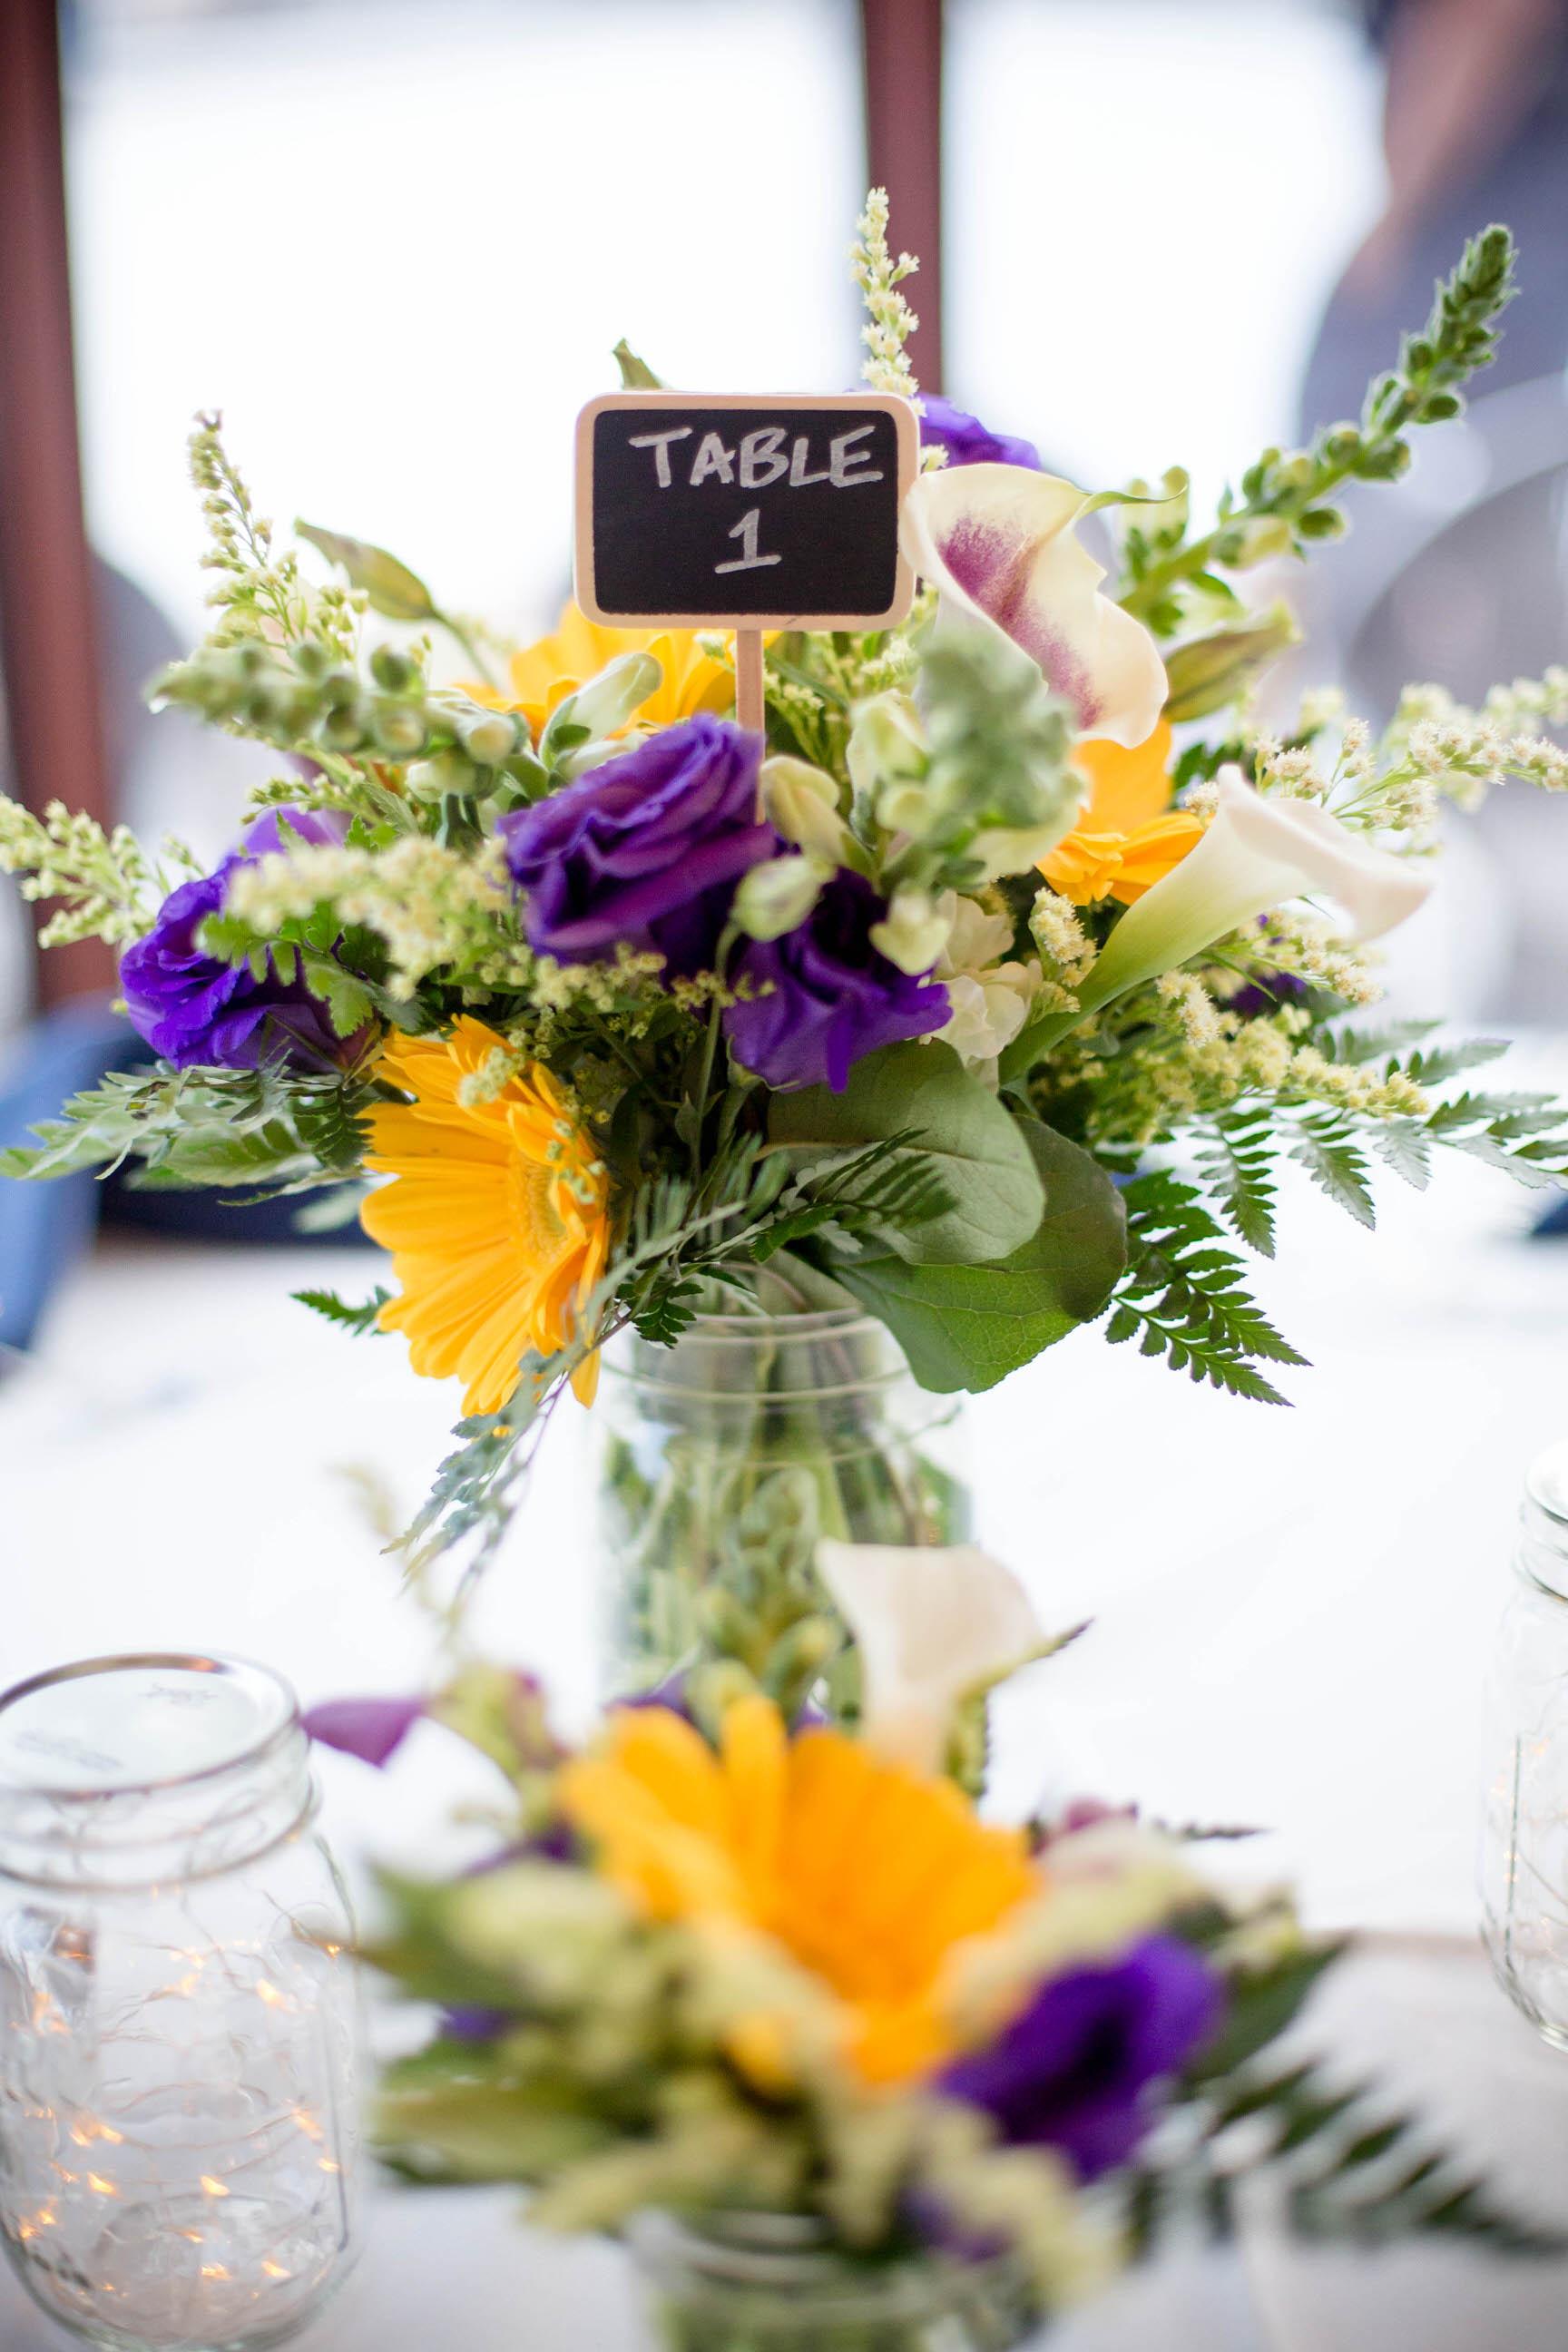 flowers-wedding-lady-delray-boat-tiny-house-photo-weddings.jpg